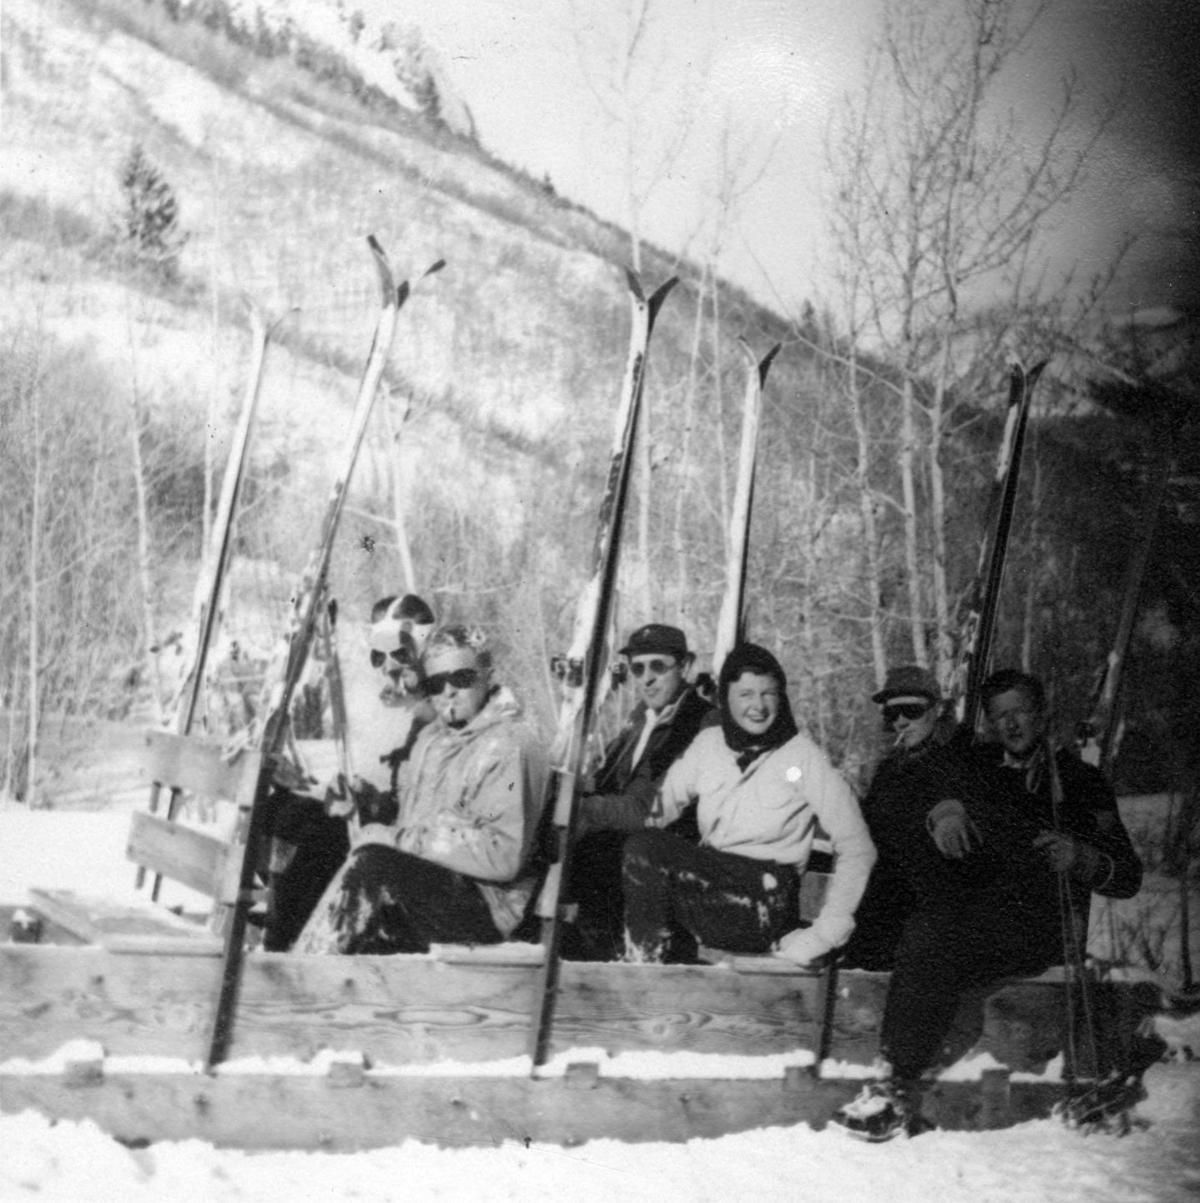 Boat Tow on Aspen Mountain in 1945